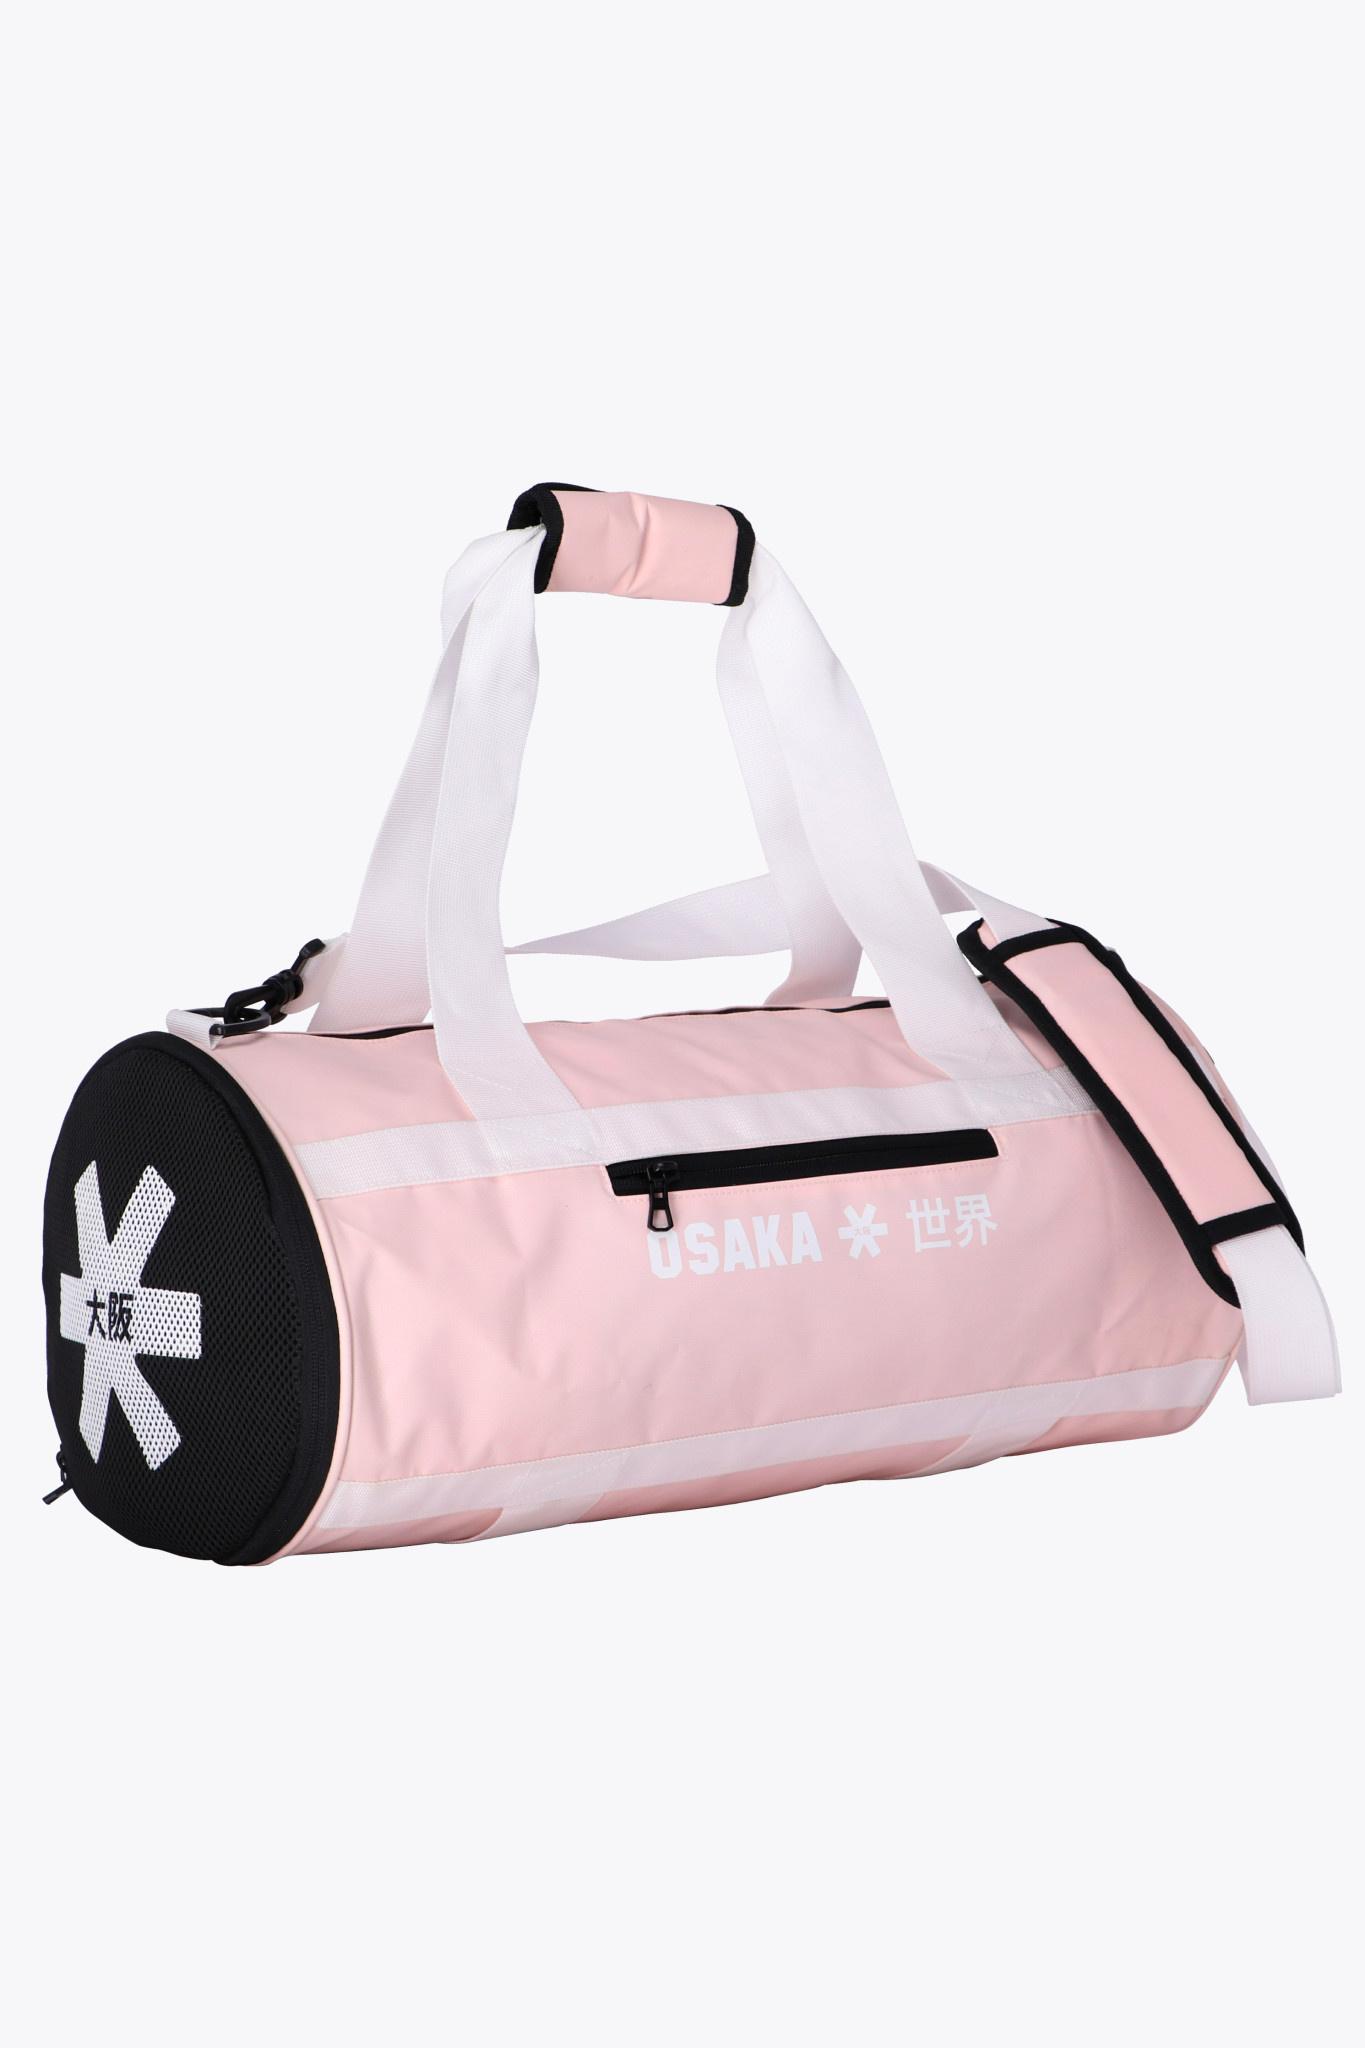 Osaka Osaka Pro Tour portsbag powder pink